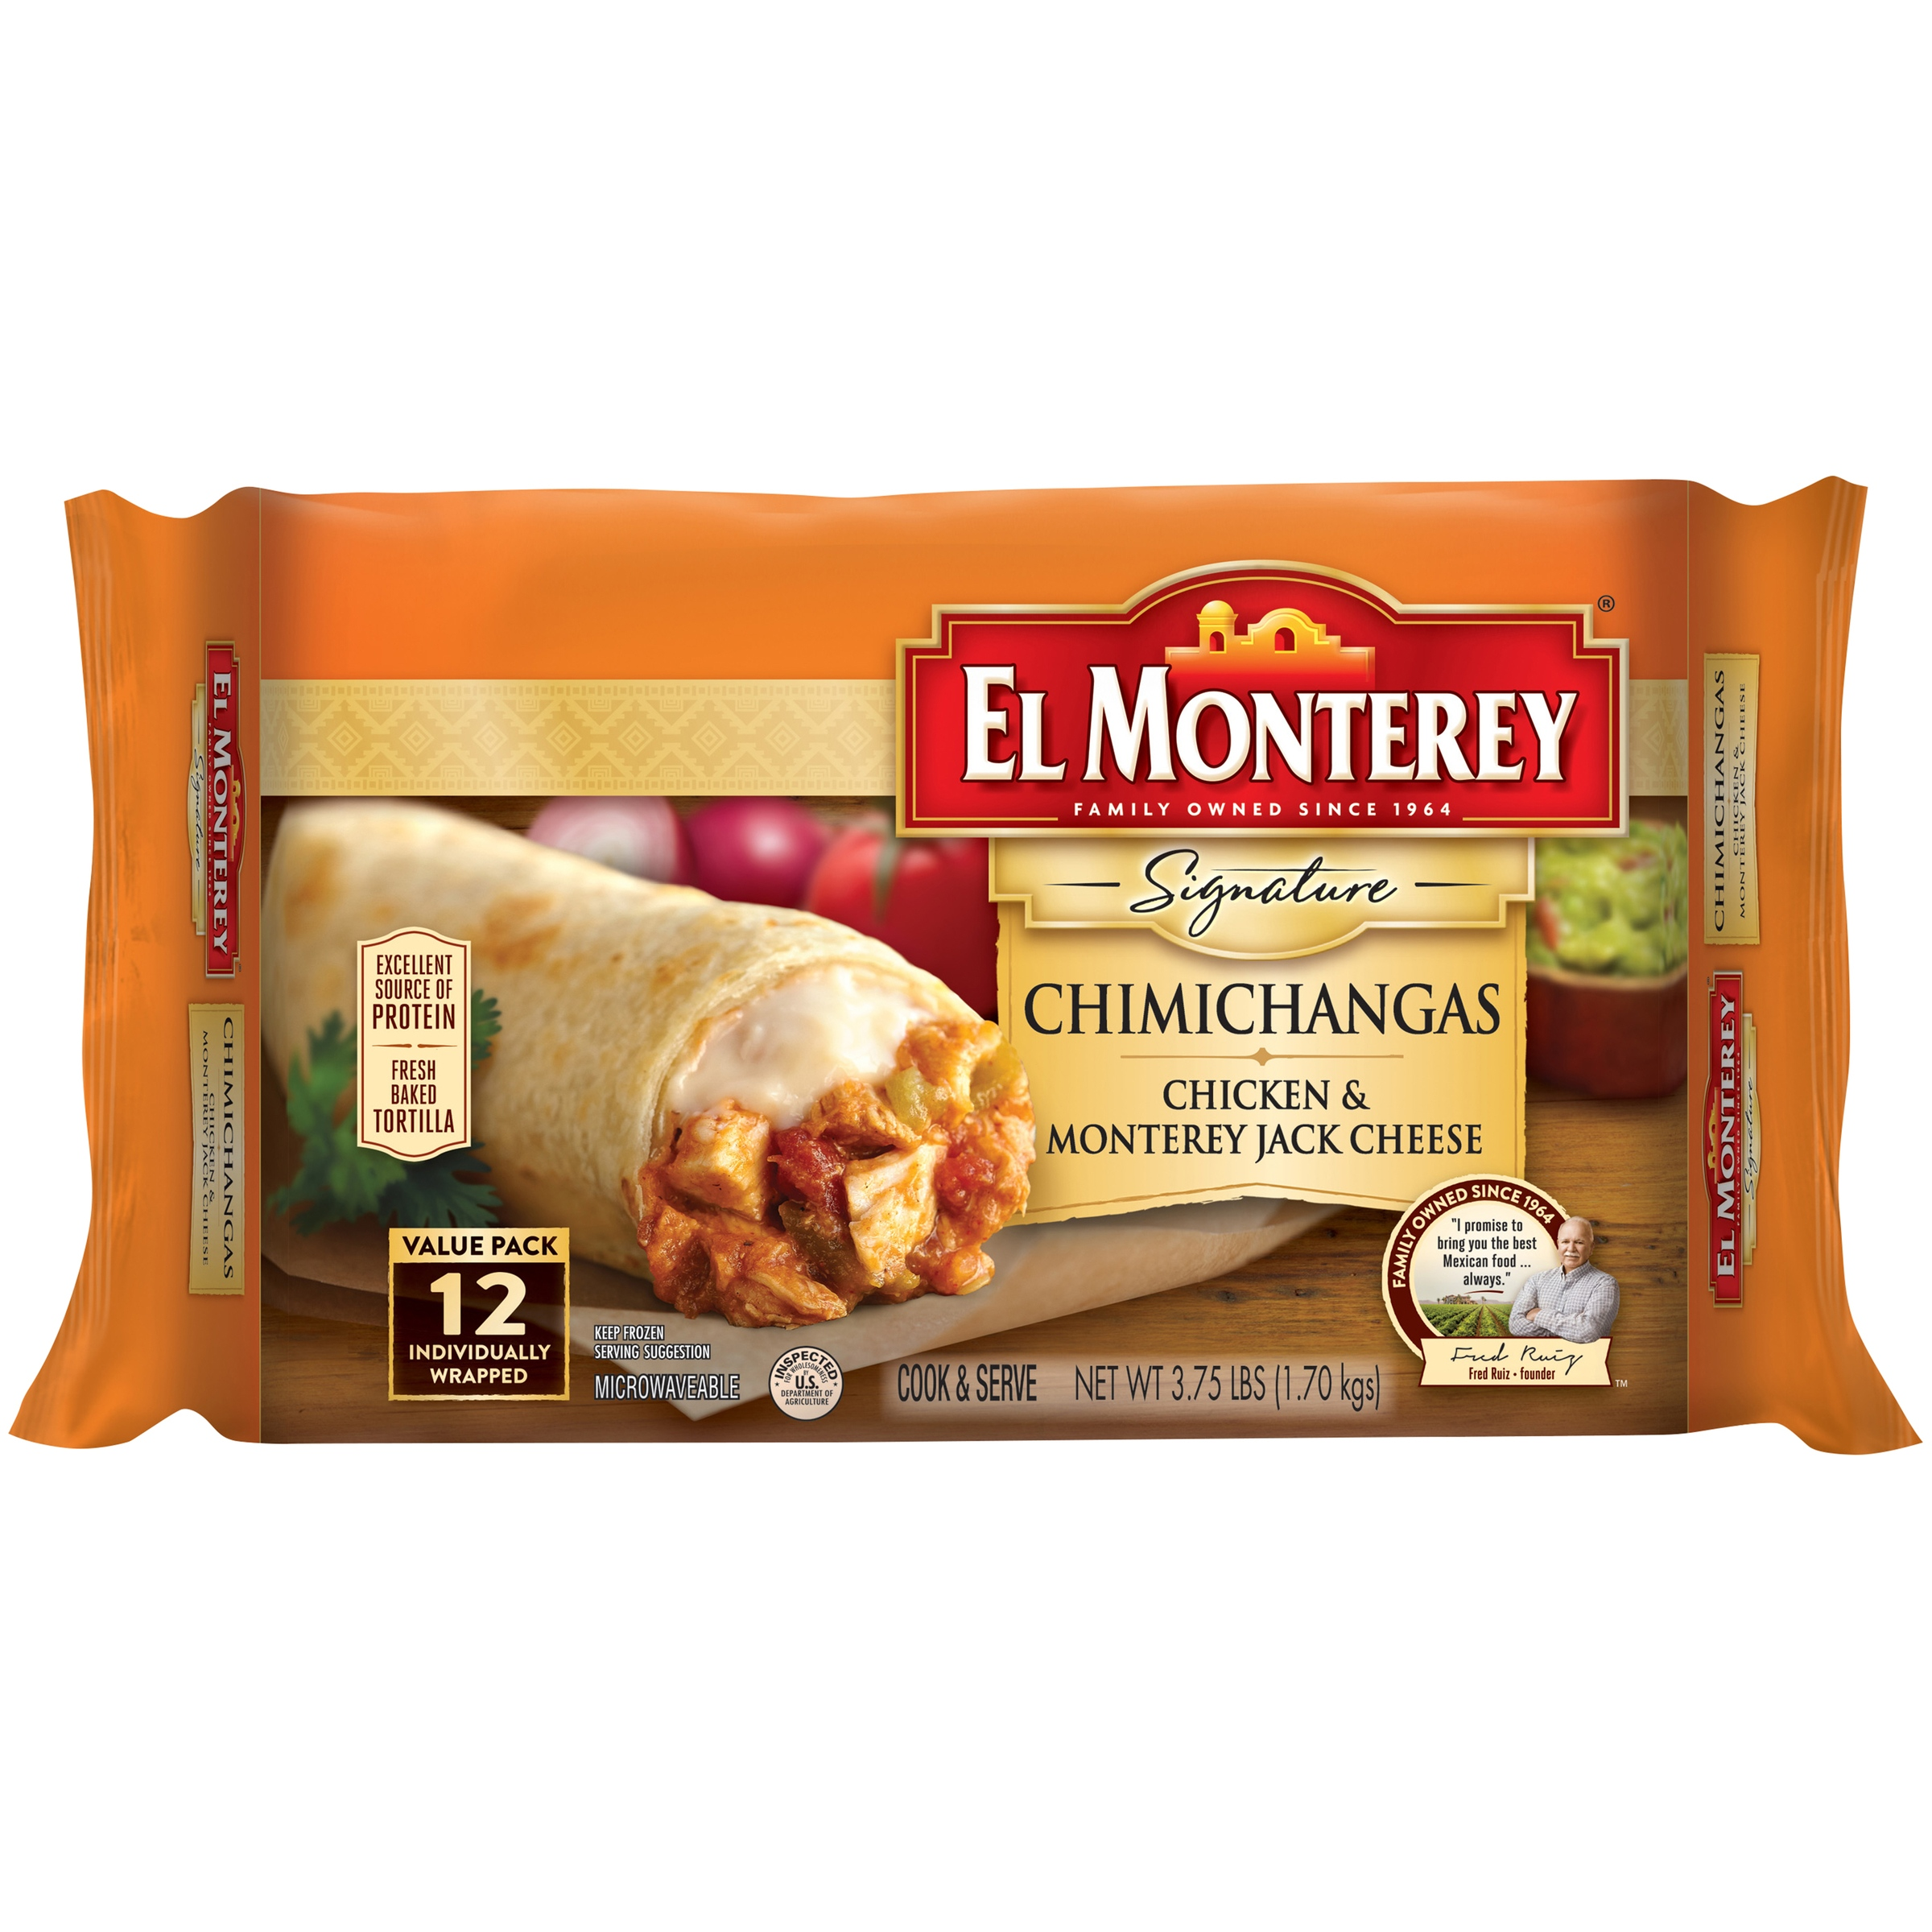 El Monterey® Signature Chicken & Monterey Jack Cheese Chimichangas 12 ct Bag